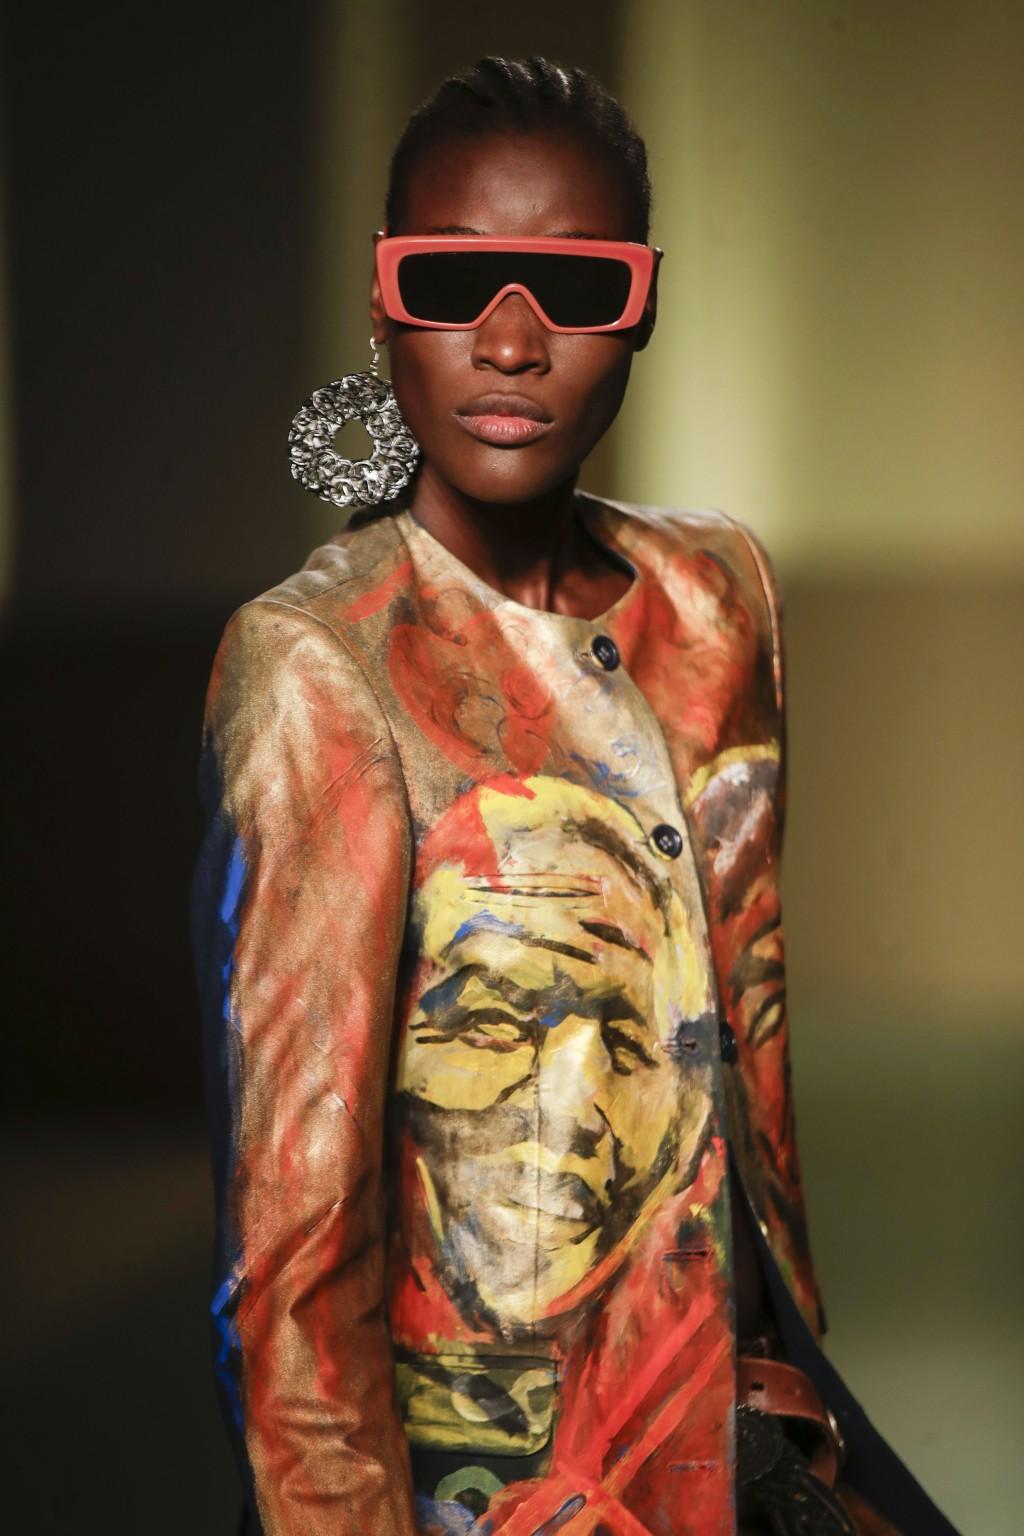 A model wears a creation by fashion designer Fabiola Manirakiza's Frida Kiza, as part of the Black Lives Matter Fall/Winter 2021/22 collective fashion...